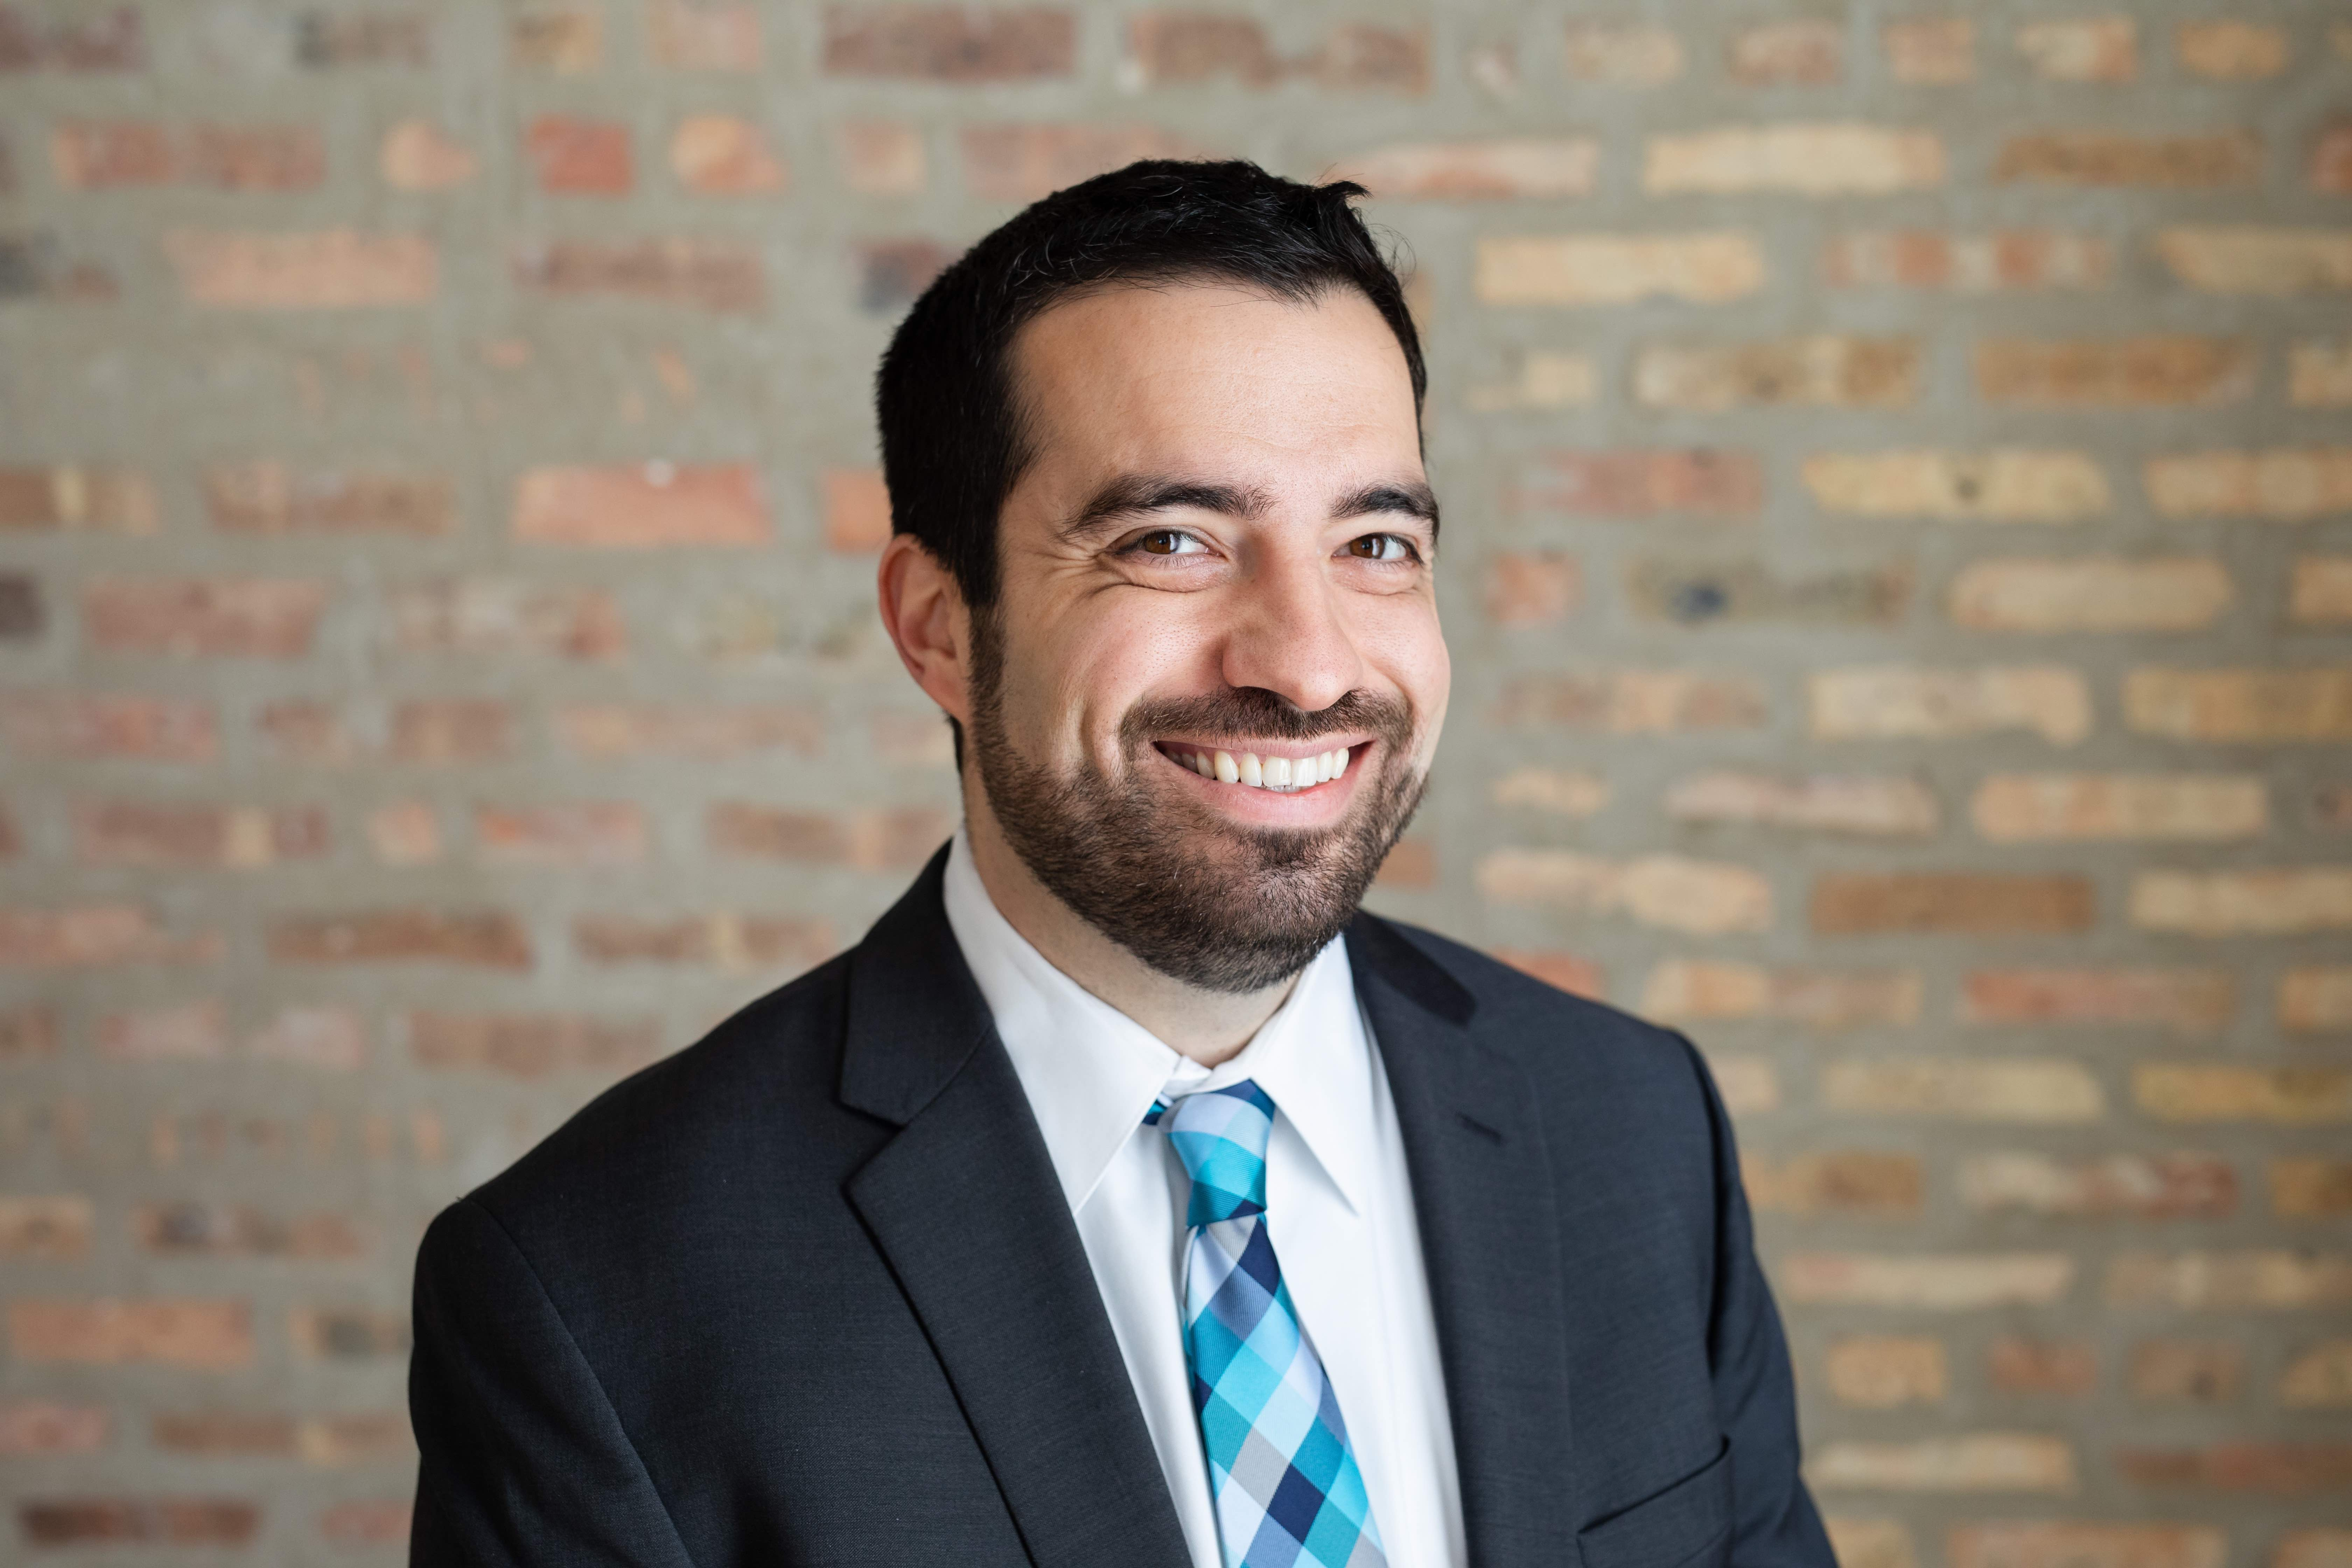 Peter Amling, financial advisor Chicago IL